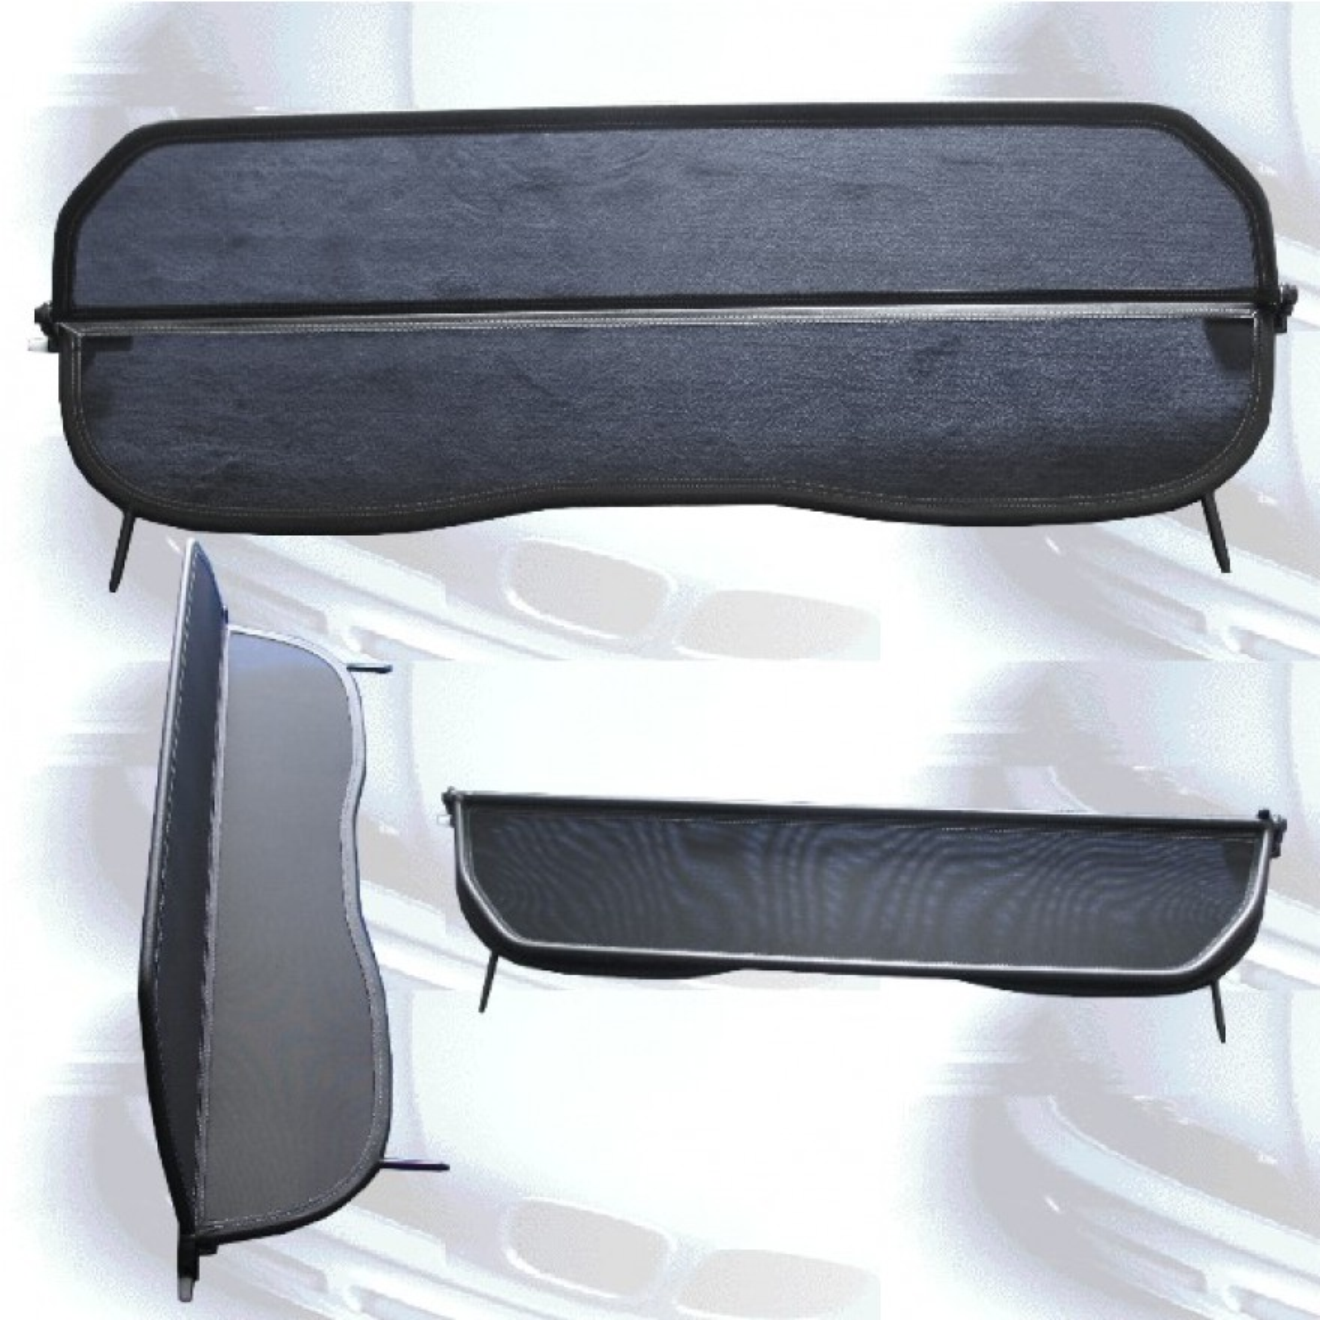 netz windschott f r peugeot 207 cc. Black Bedroom Furniture Sets. Home Design Ideas